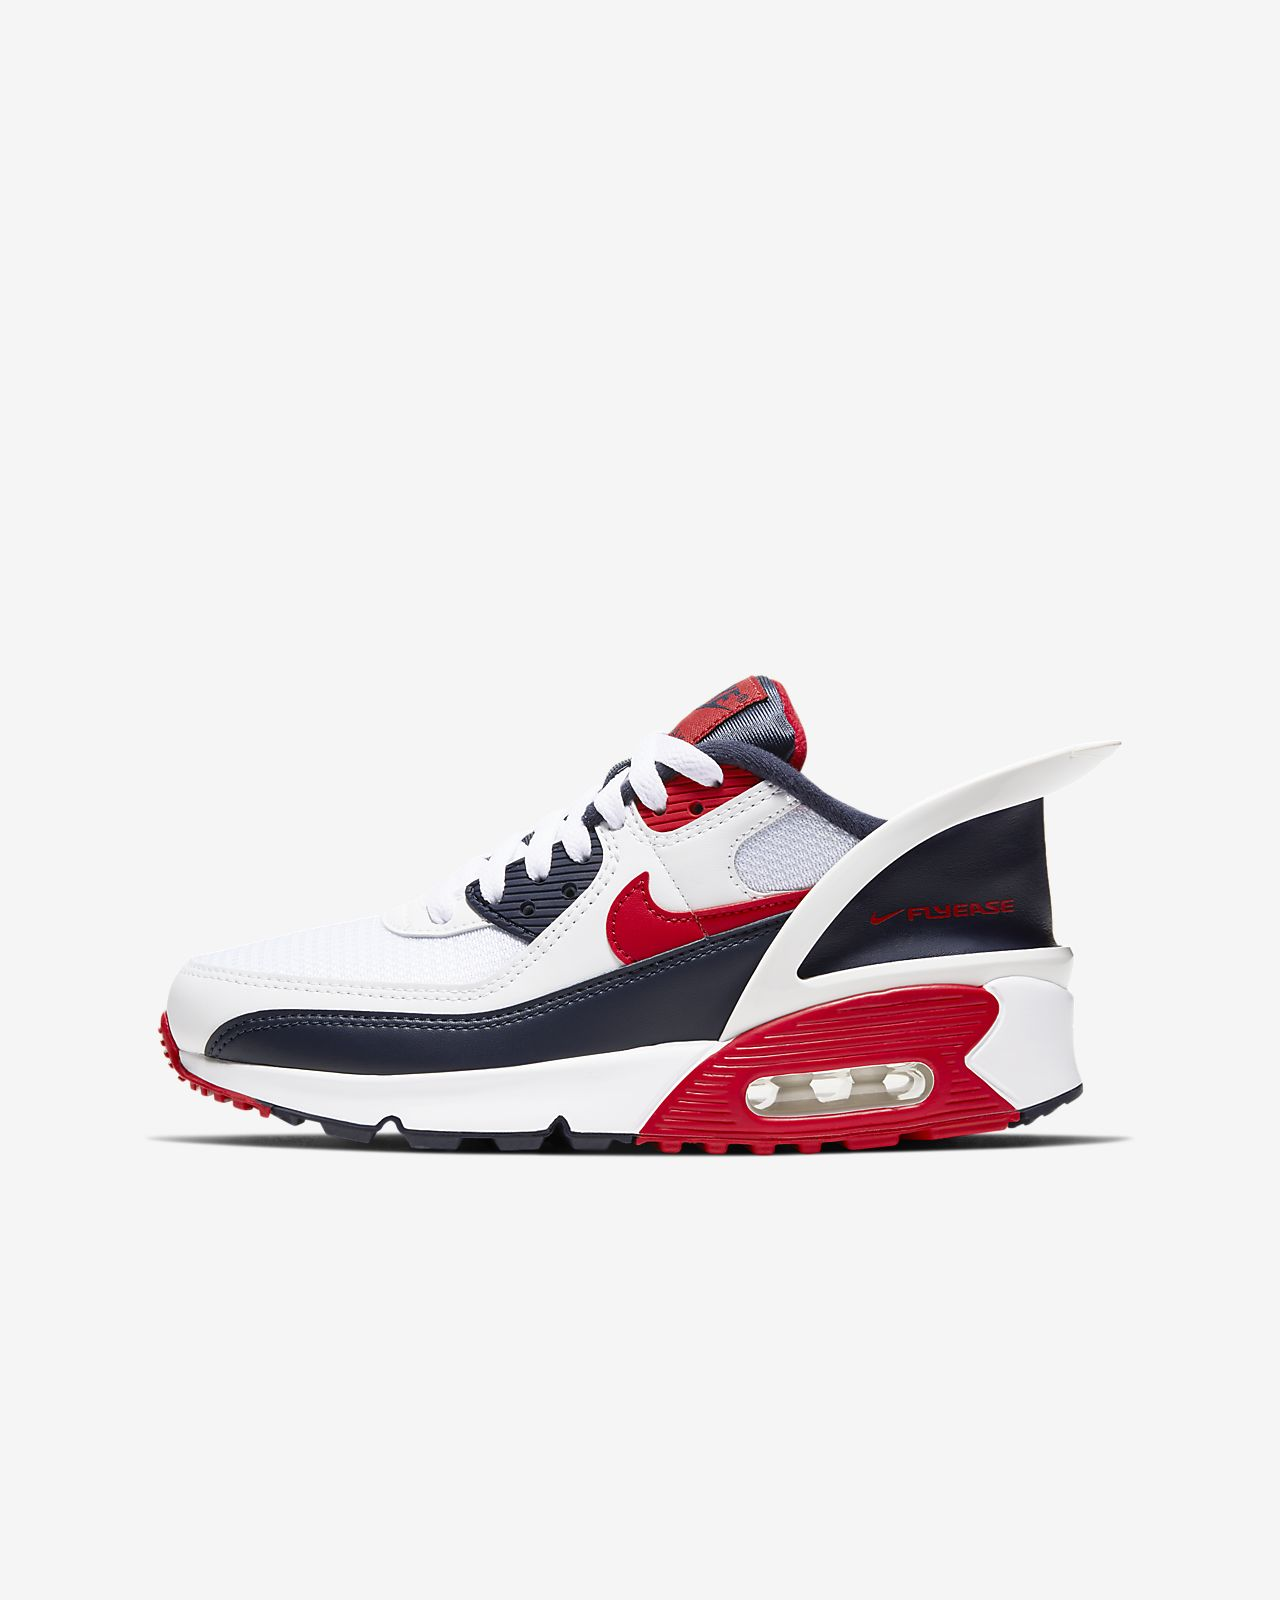 Nike Air Max 90 Kinderschoen. Nike NL